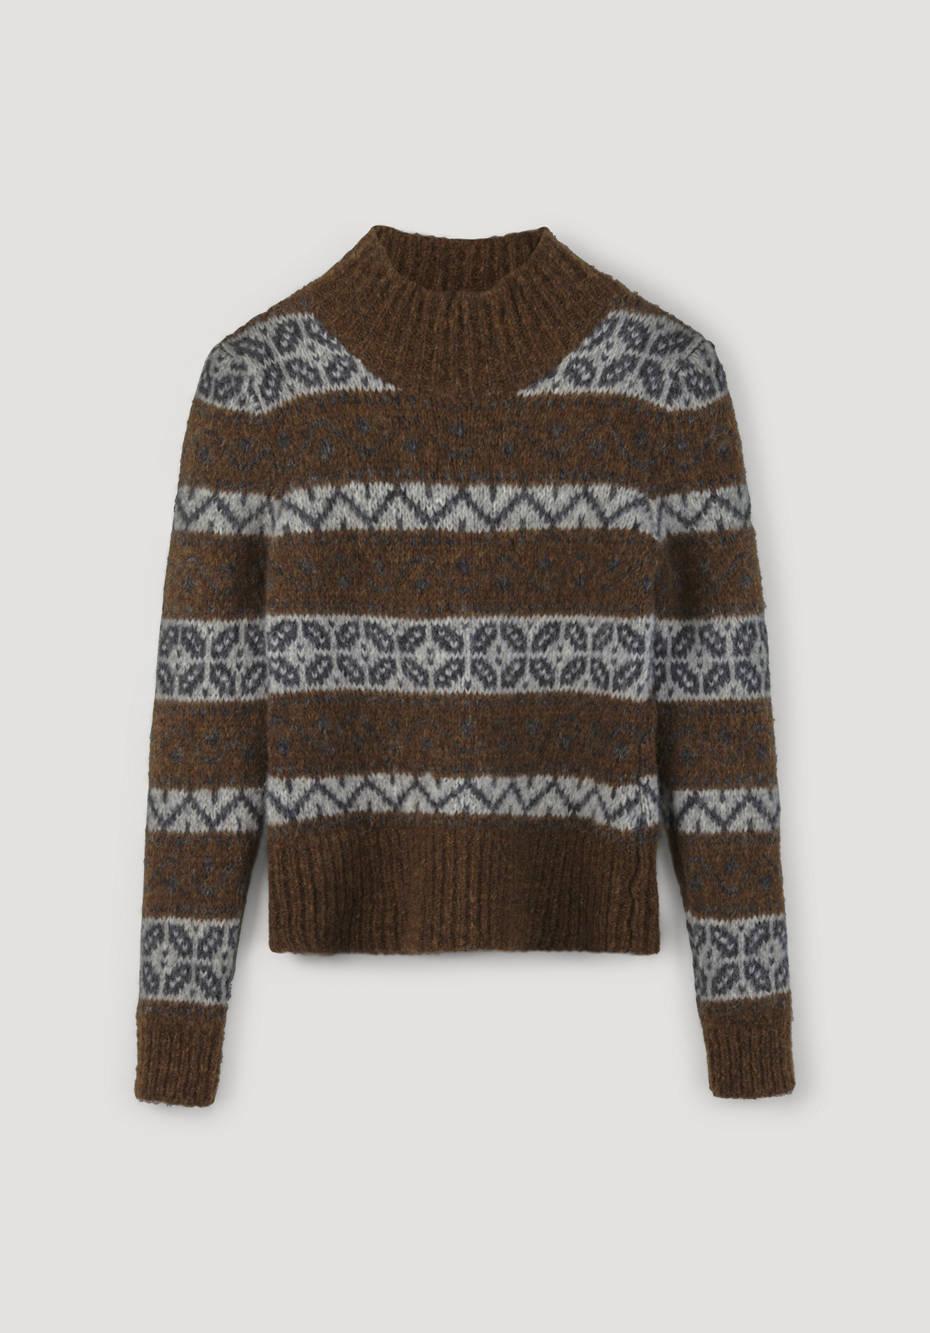 Jacquard-Pullover aus Alpaka mit Pima Baumwolle